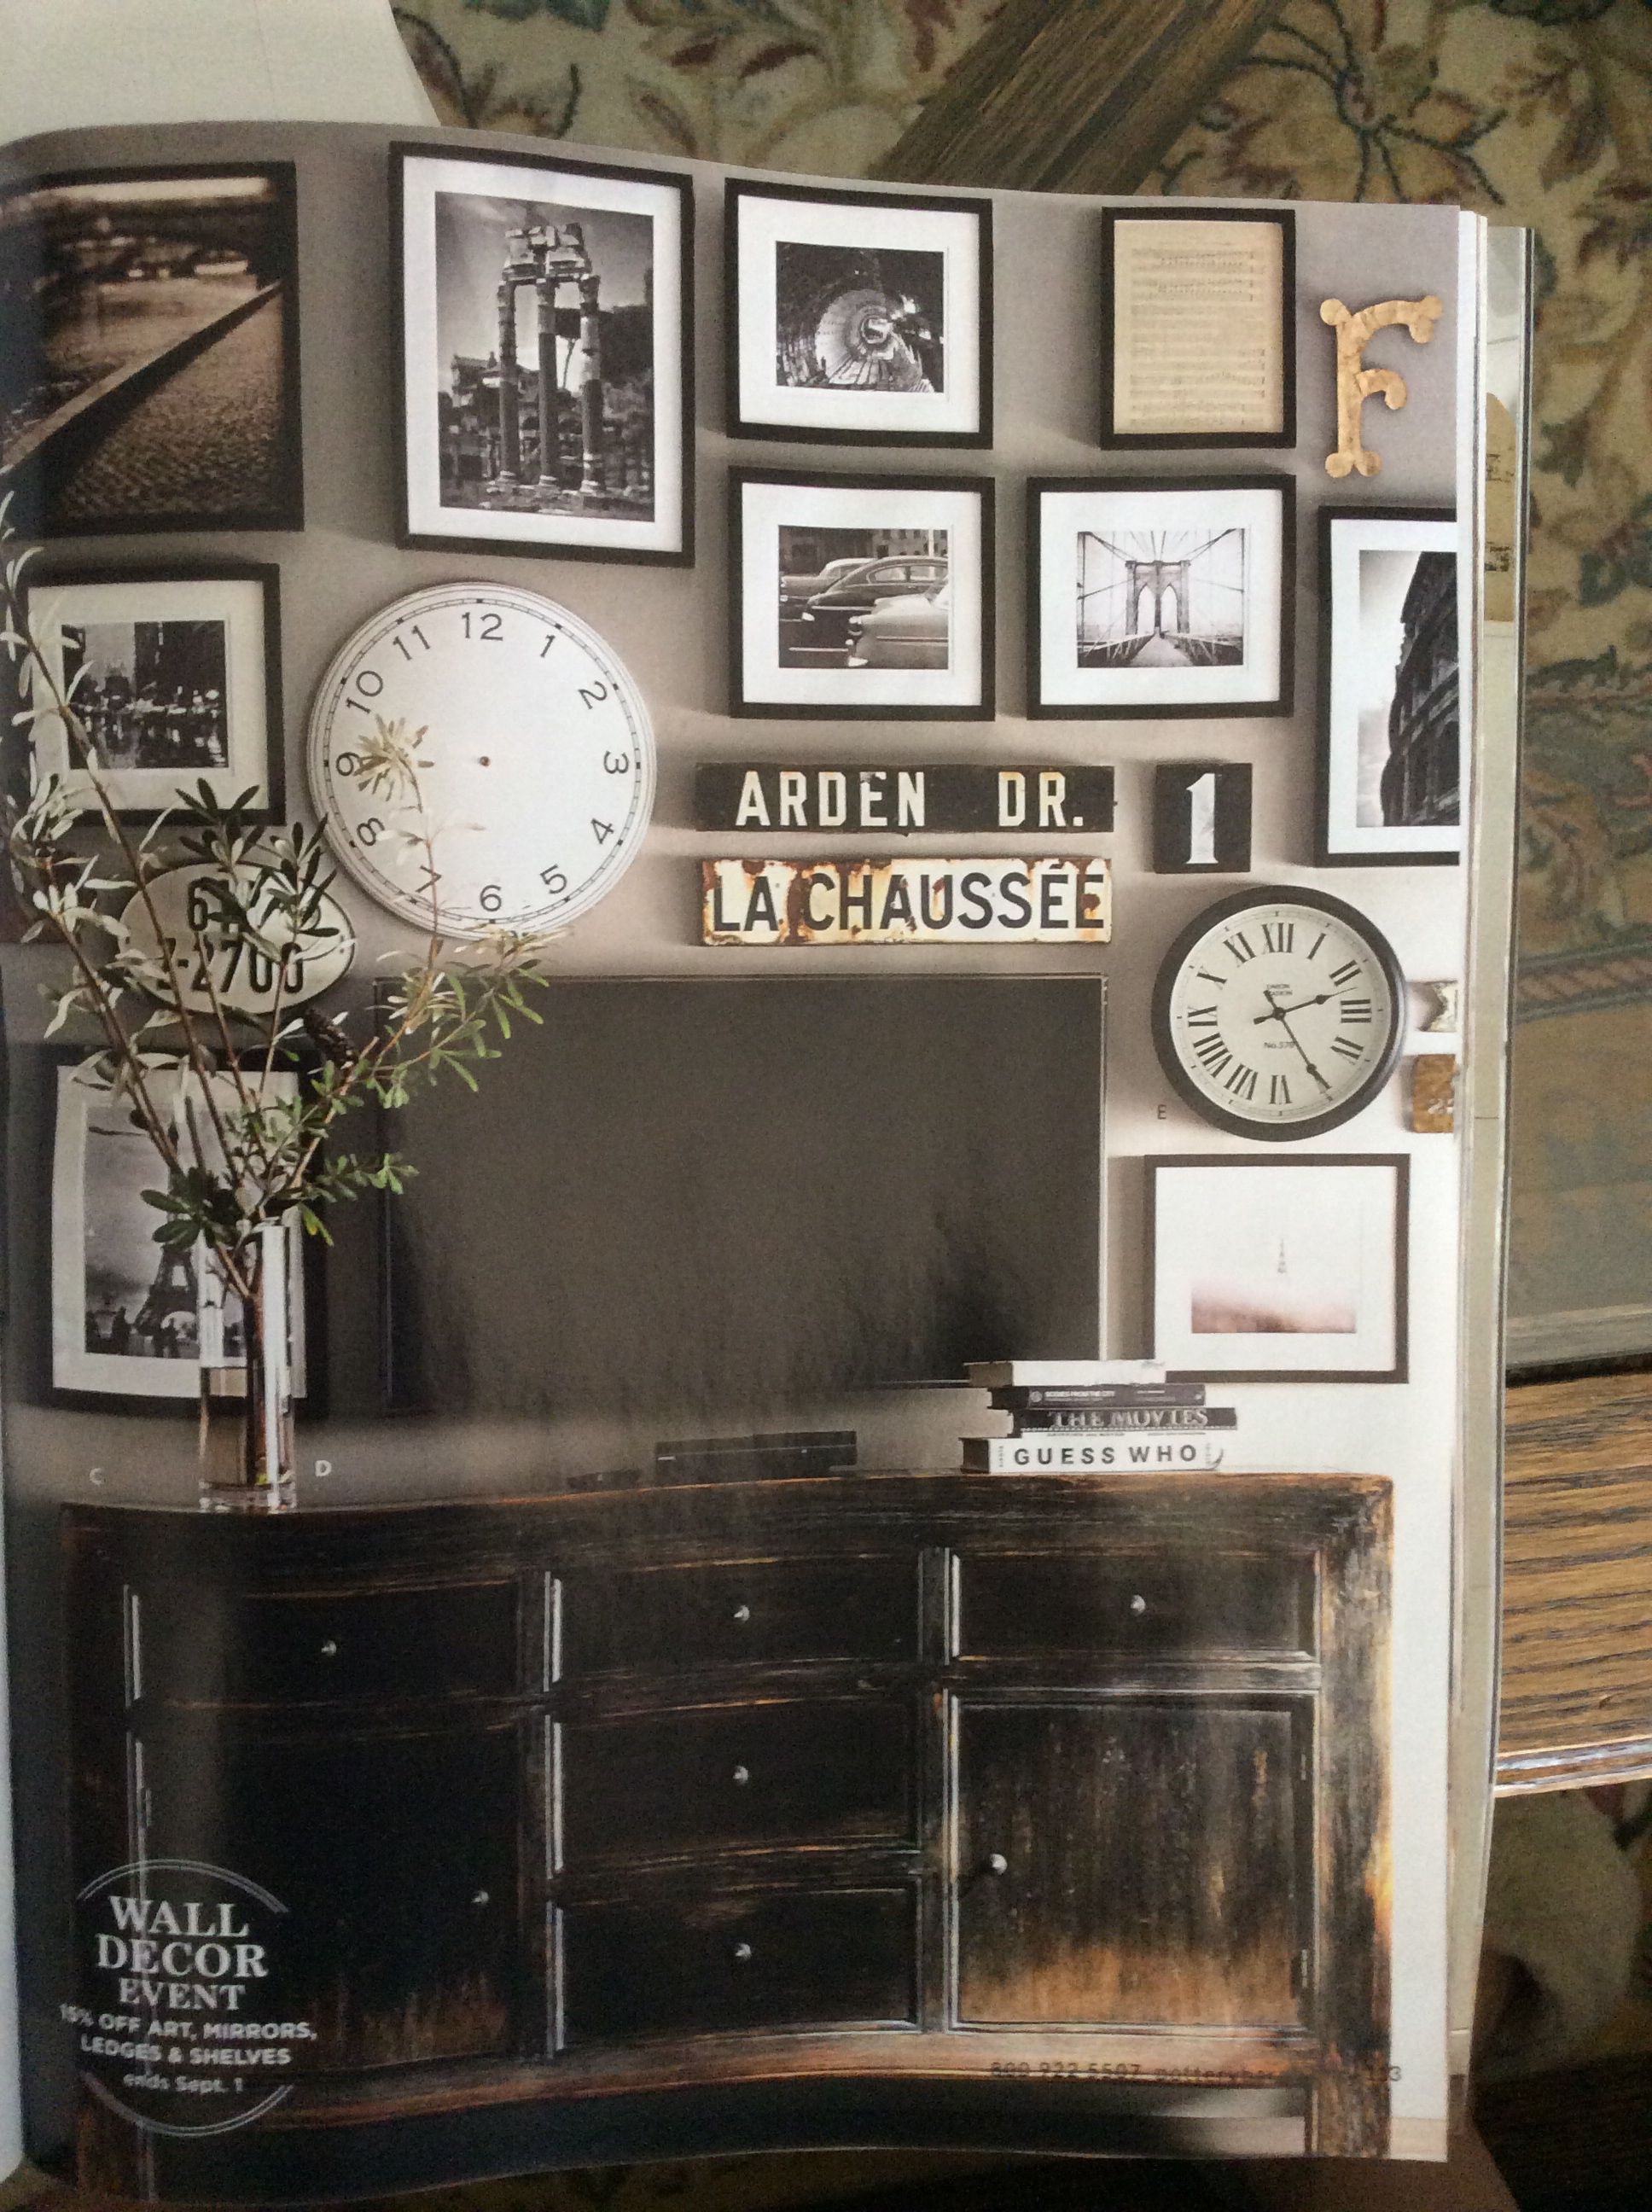 Pottery Barn Decor Living Room Tv Wall Farm House Living Room Interior #pottery #barn #living #room #inspiration